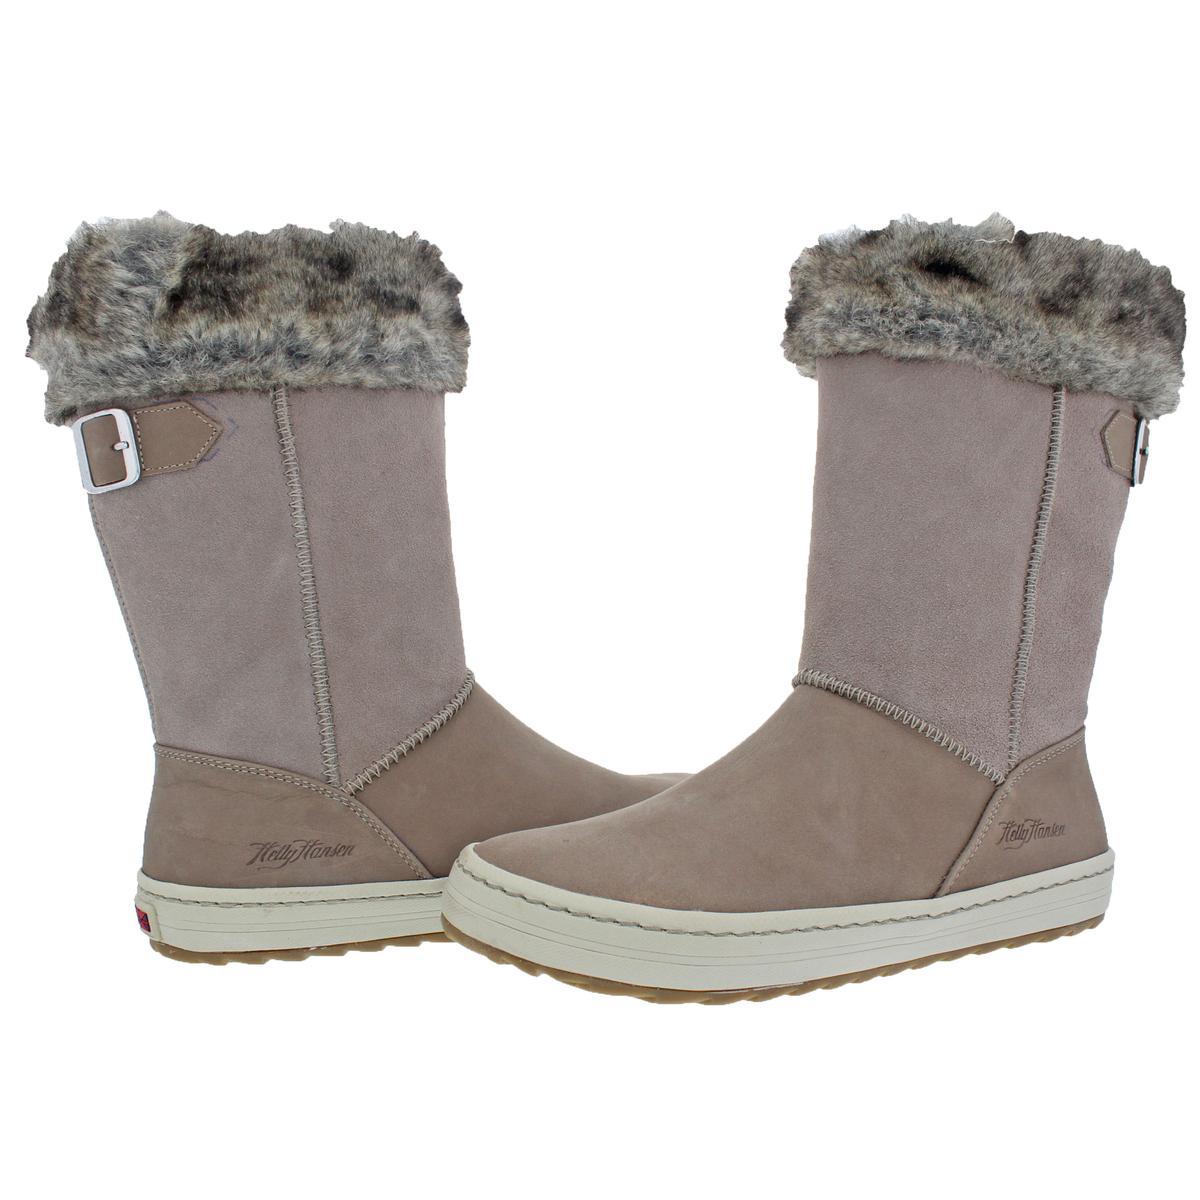 Helly Hansen Waterproof Womens Alexandra 2 Suede Waterproof Hansen Winter Boots Shoes BHFO 7153 f0a788